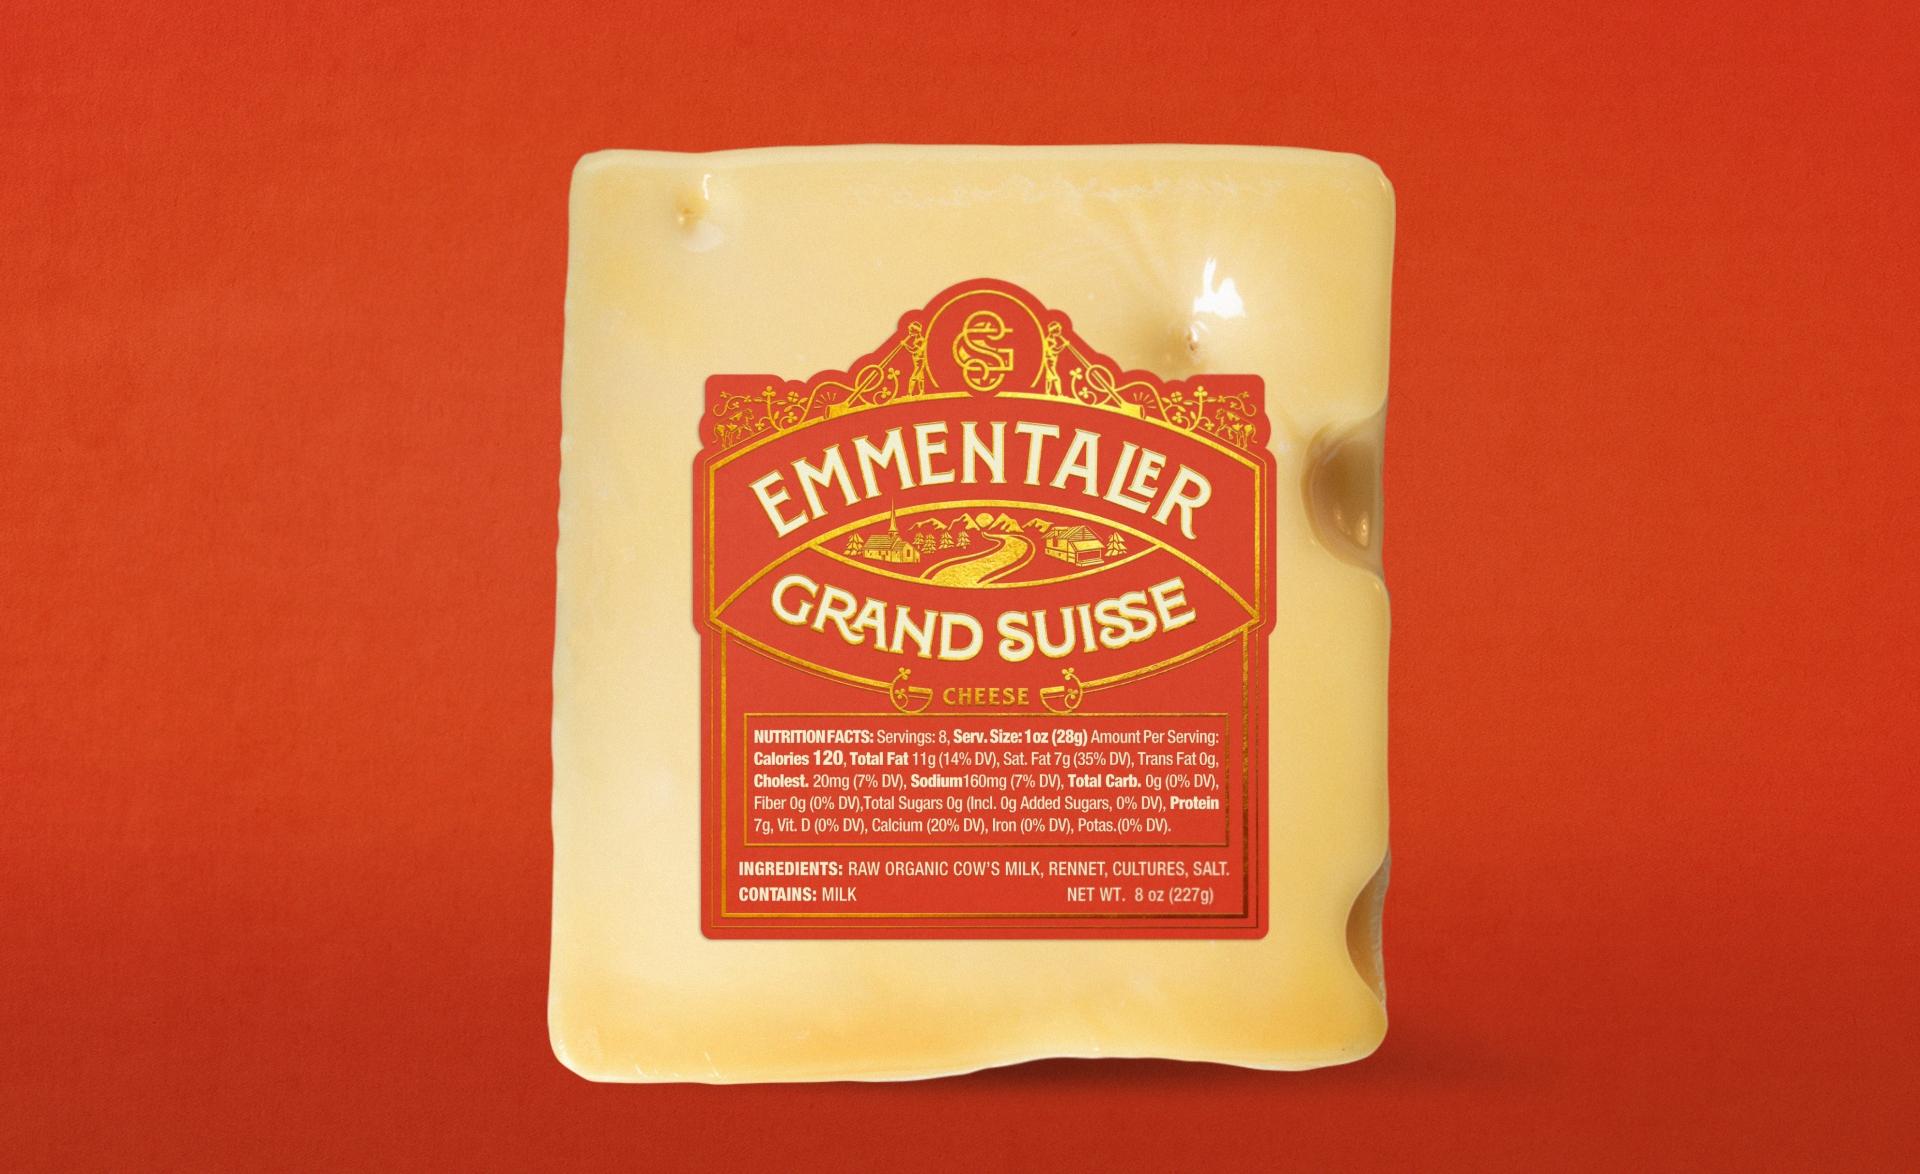 front-label-cheese-emmentaler-preview-grand-suisse-close-zeki-michael-design-branding-studio-packaging-red copy